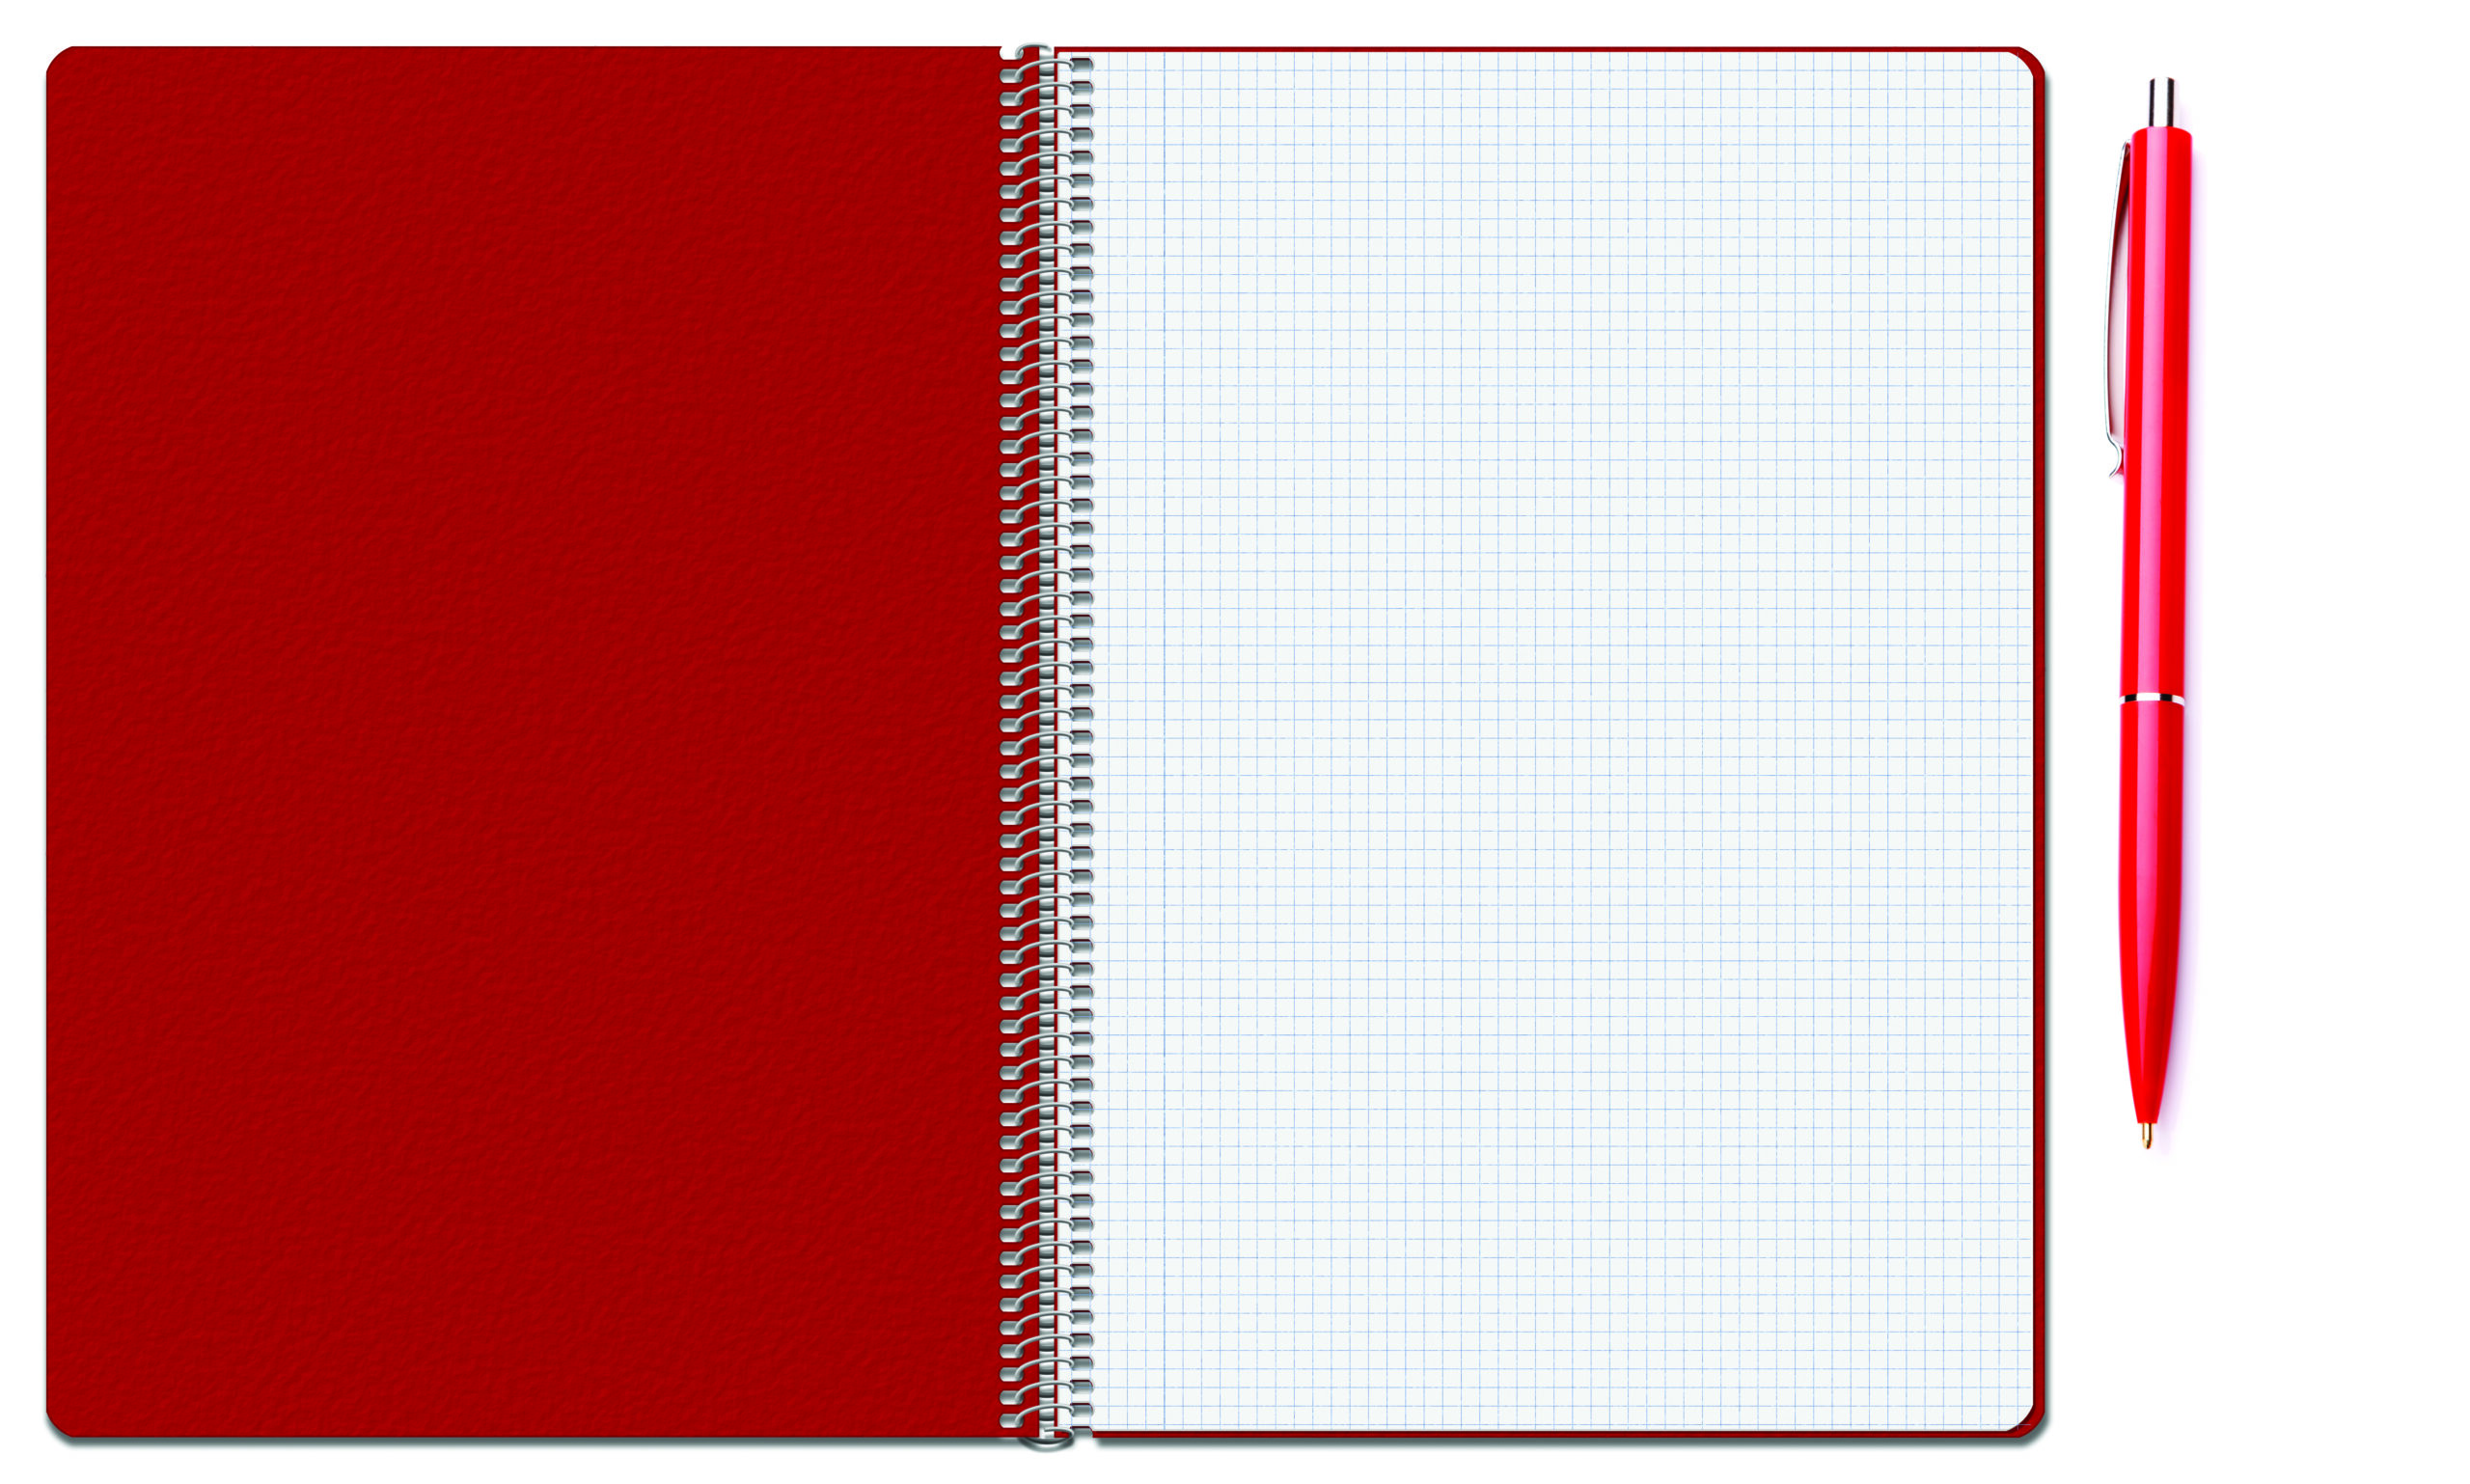 Red notebook & pen